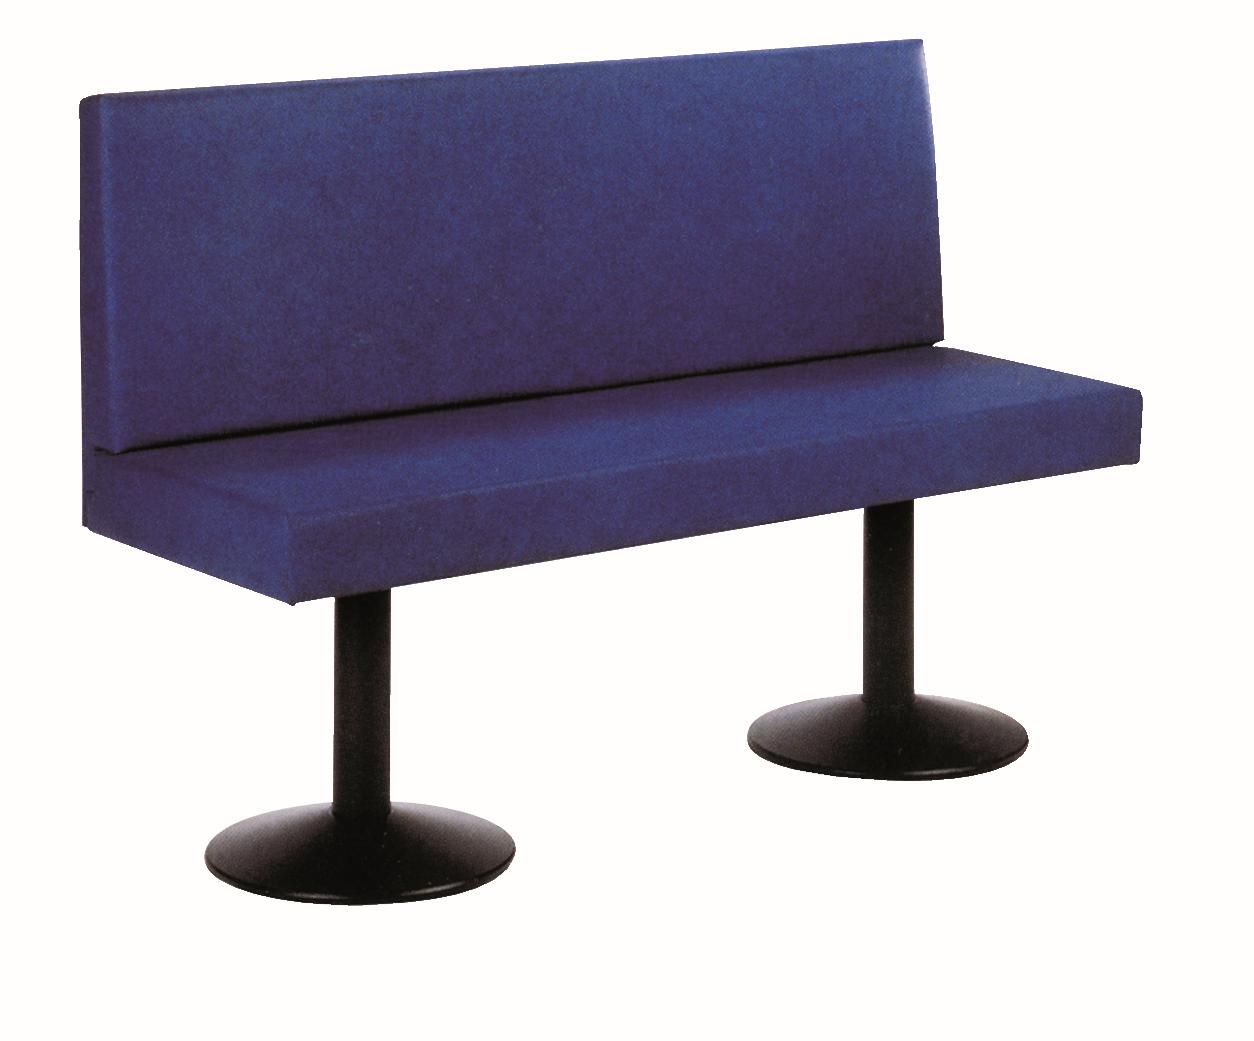 Vendita sedie tavoli divani sgabelli poltroncine imbottiti franzoni sedie e tavoli - Affitto tavoli e sedie ...